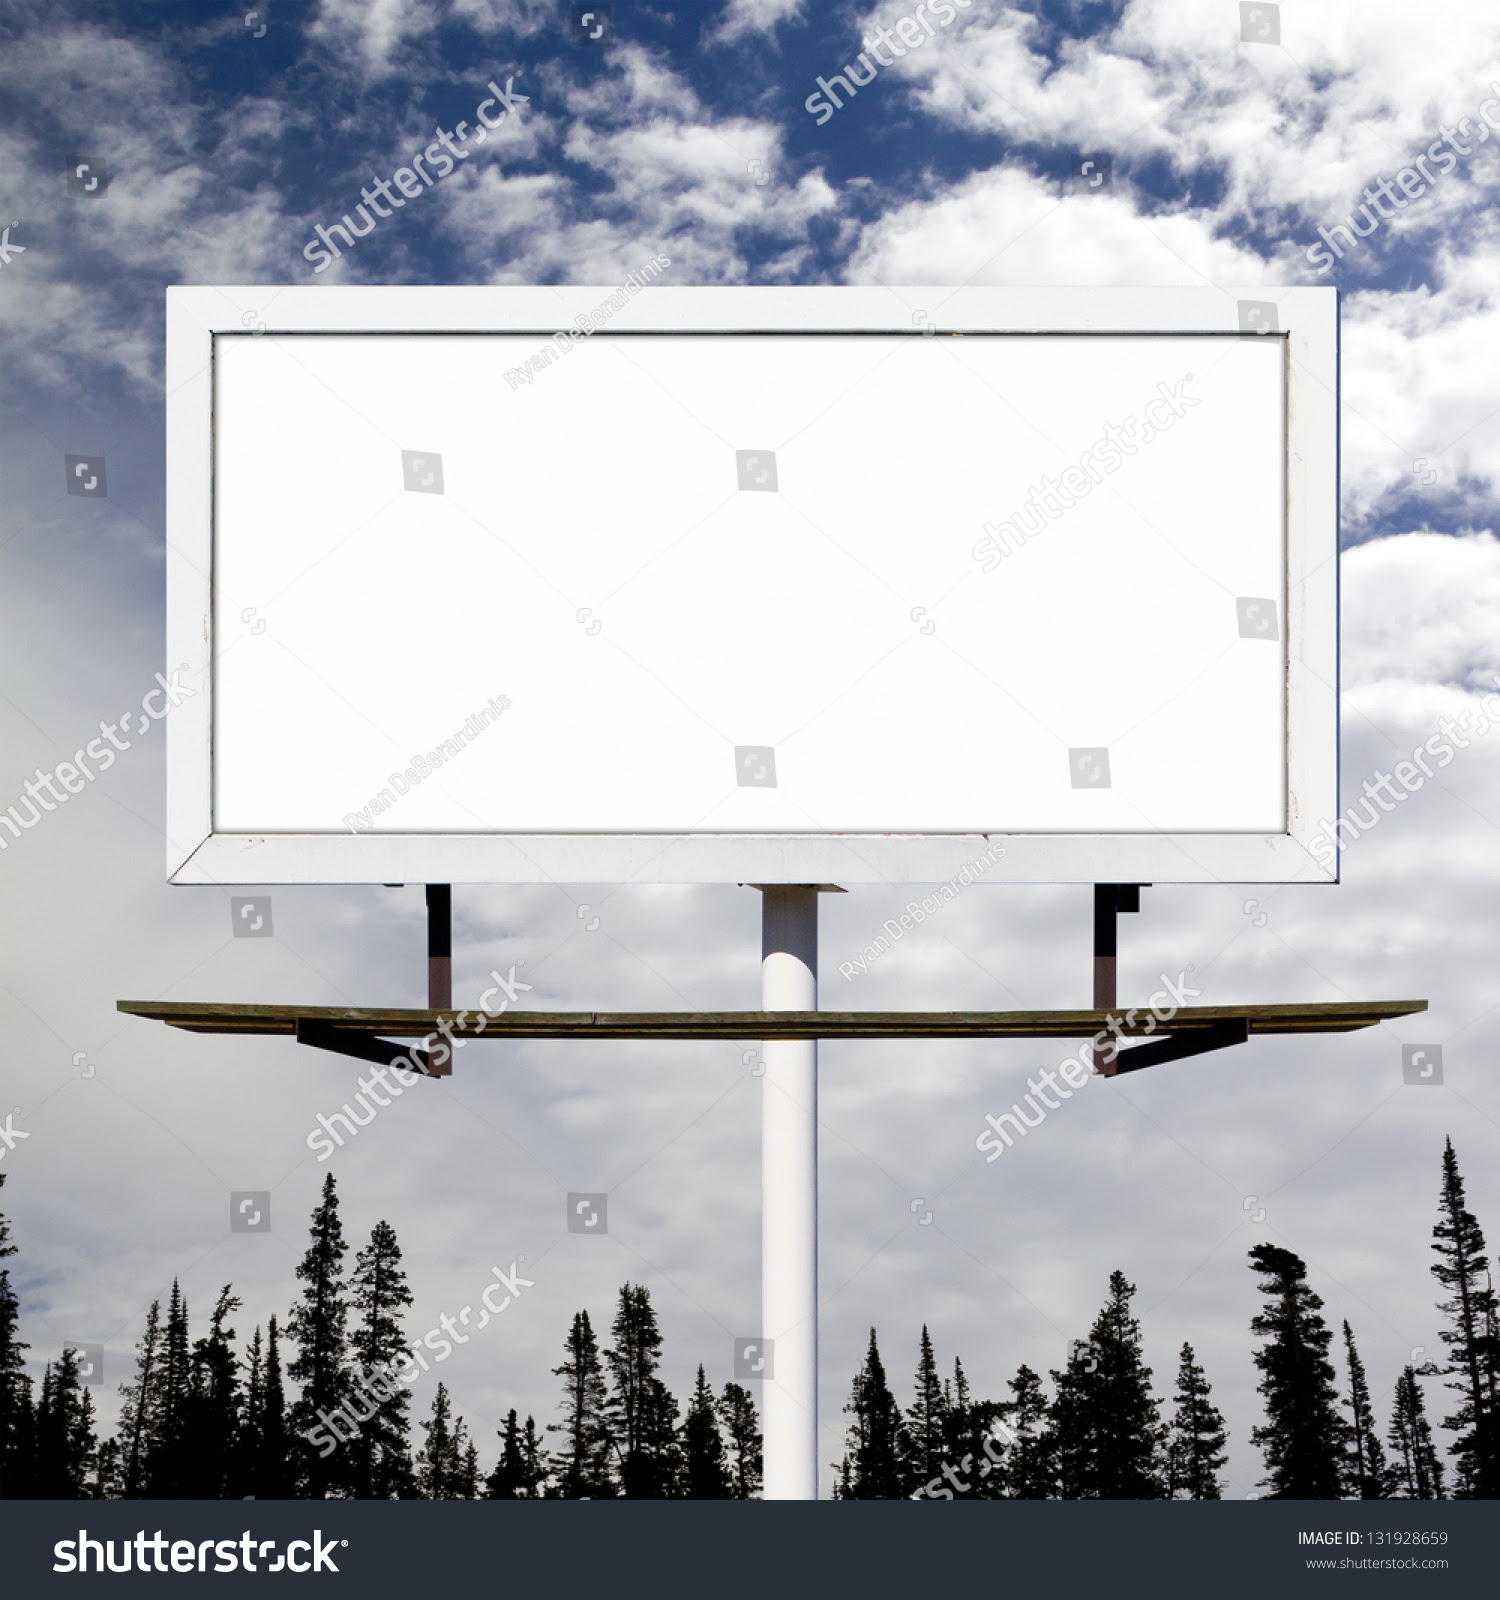 Blank Billboard Sign Against Blue Sky Stock Photo 131928659 ...